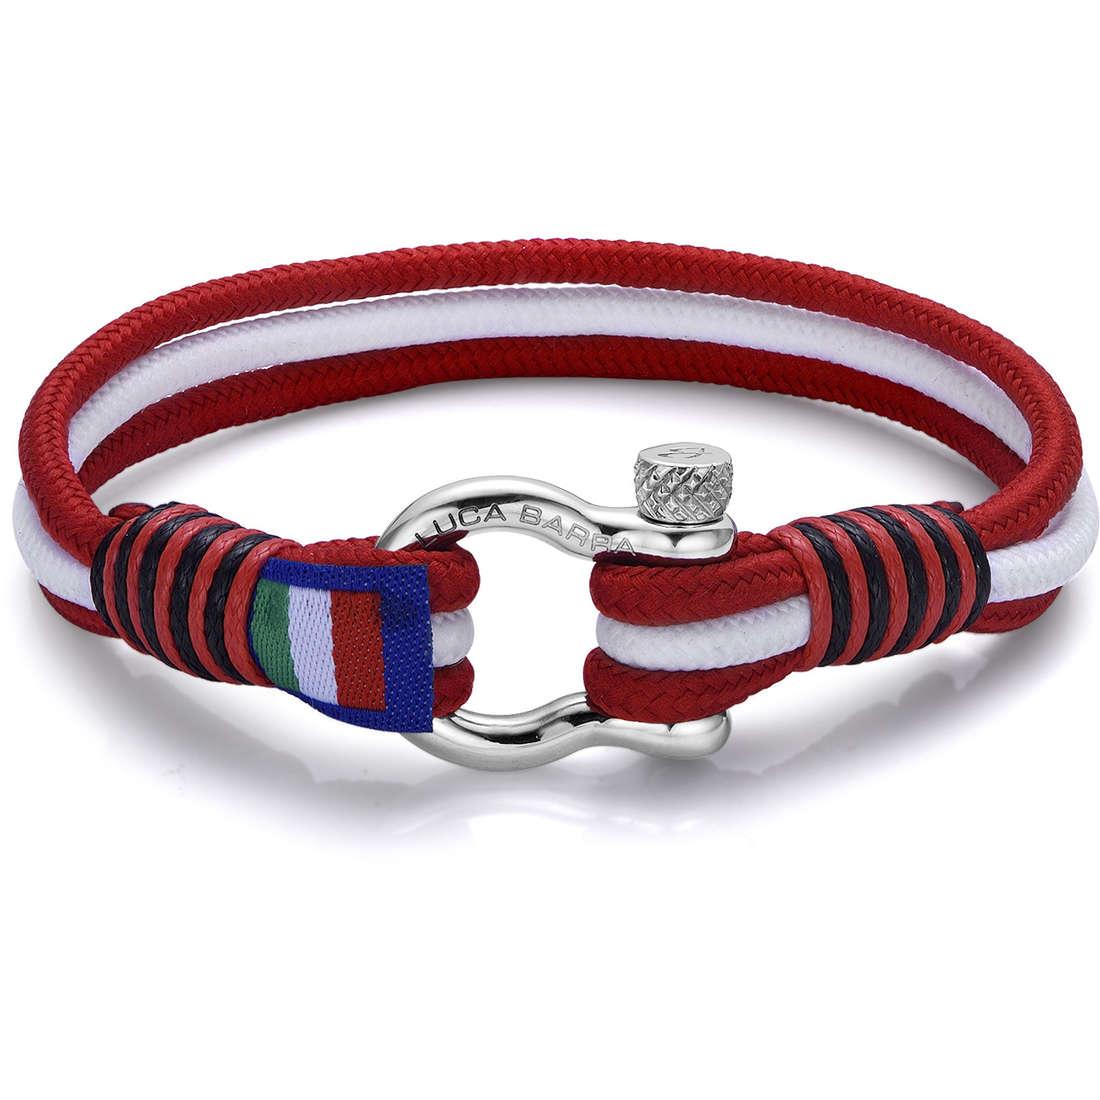 Luca Barra Homme Sailor Lbba892 Bracelet Bijoux b7yvY6gf